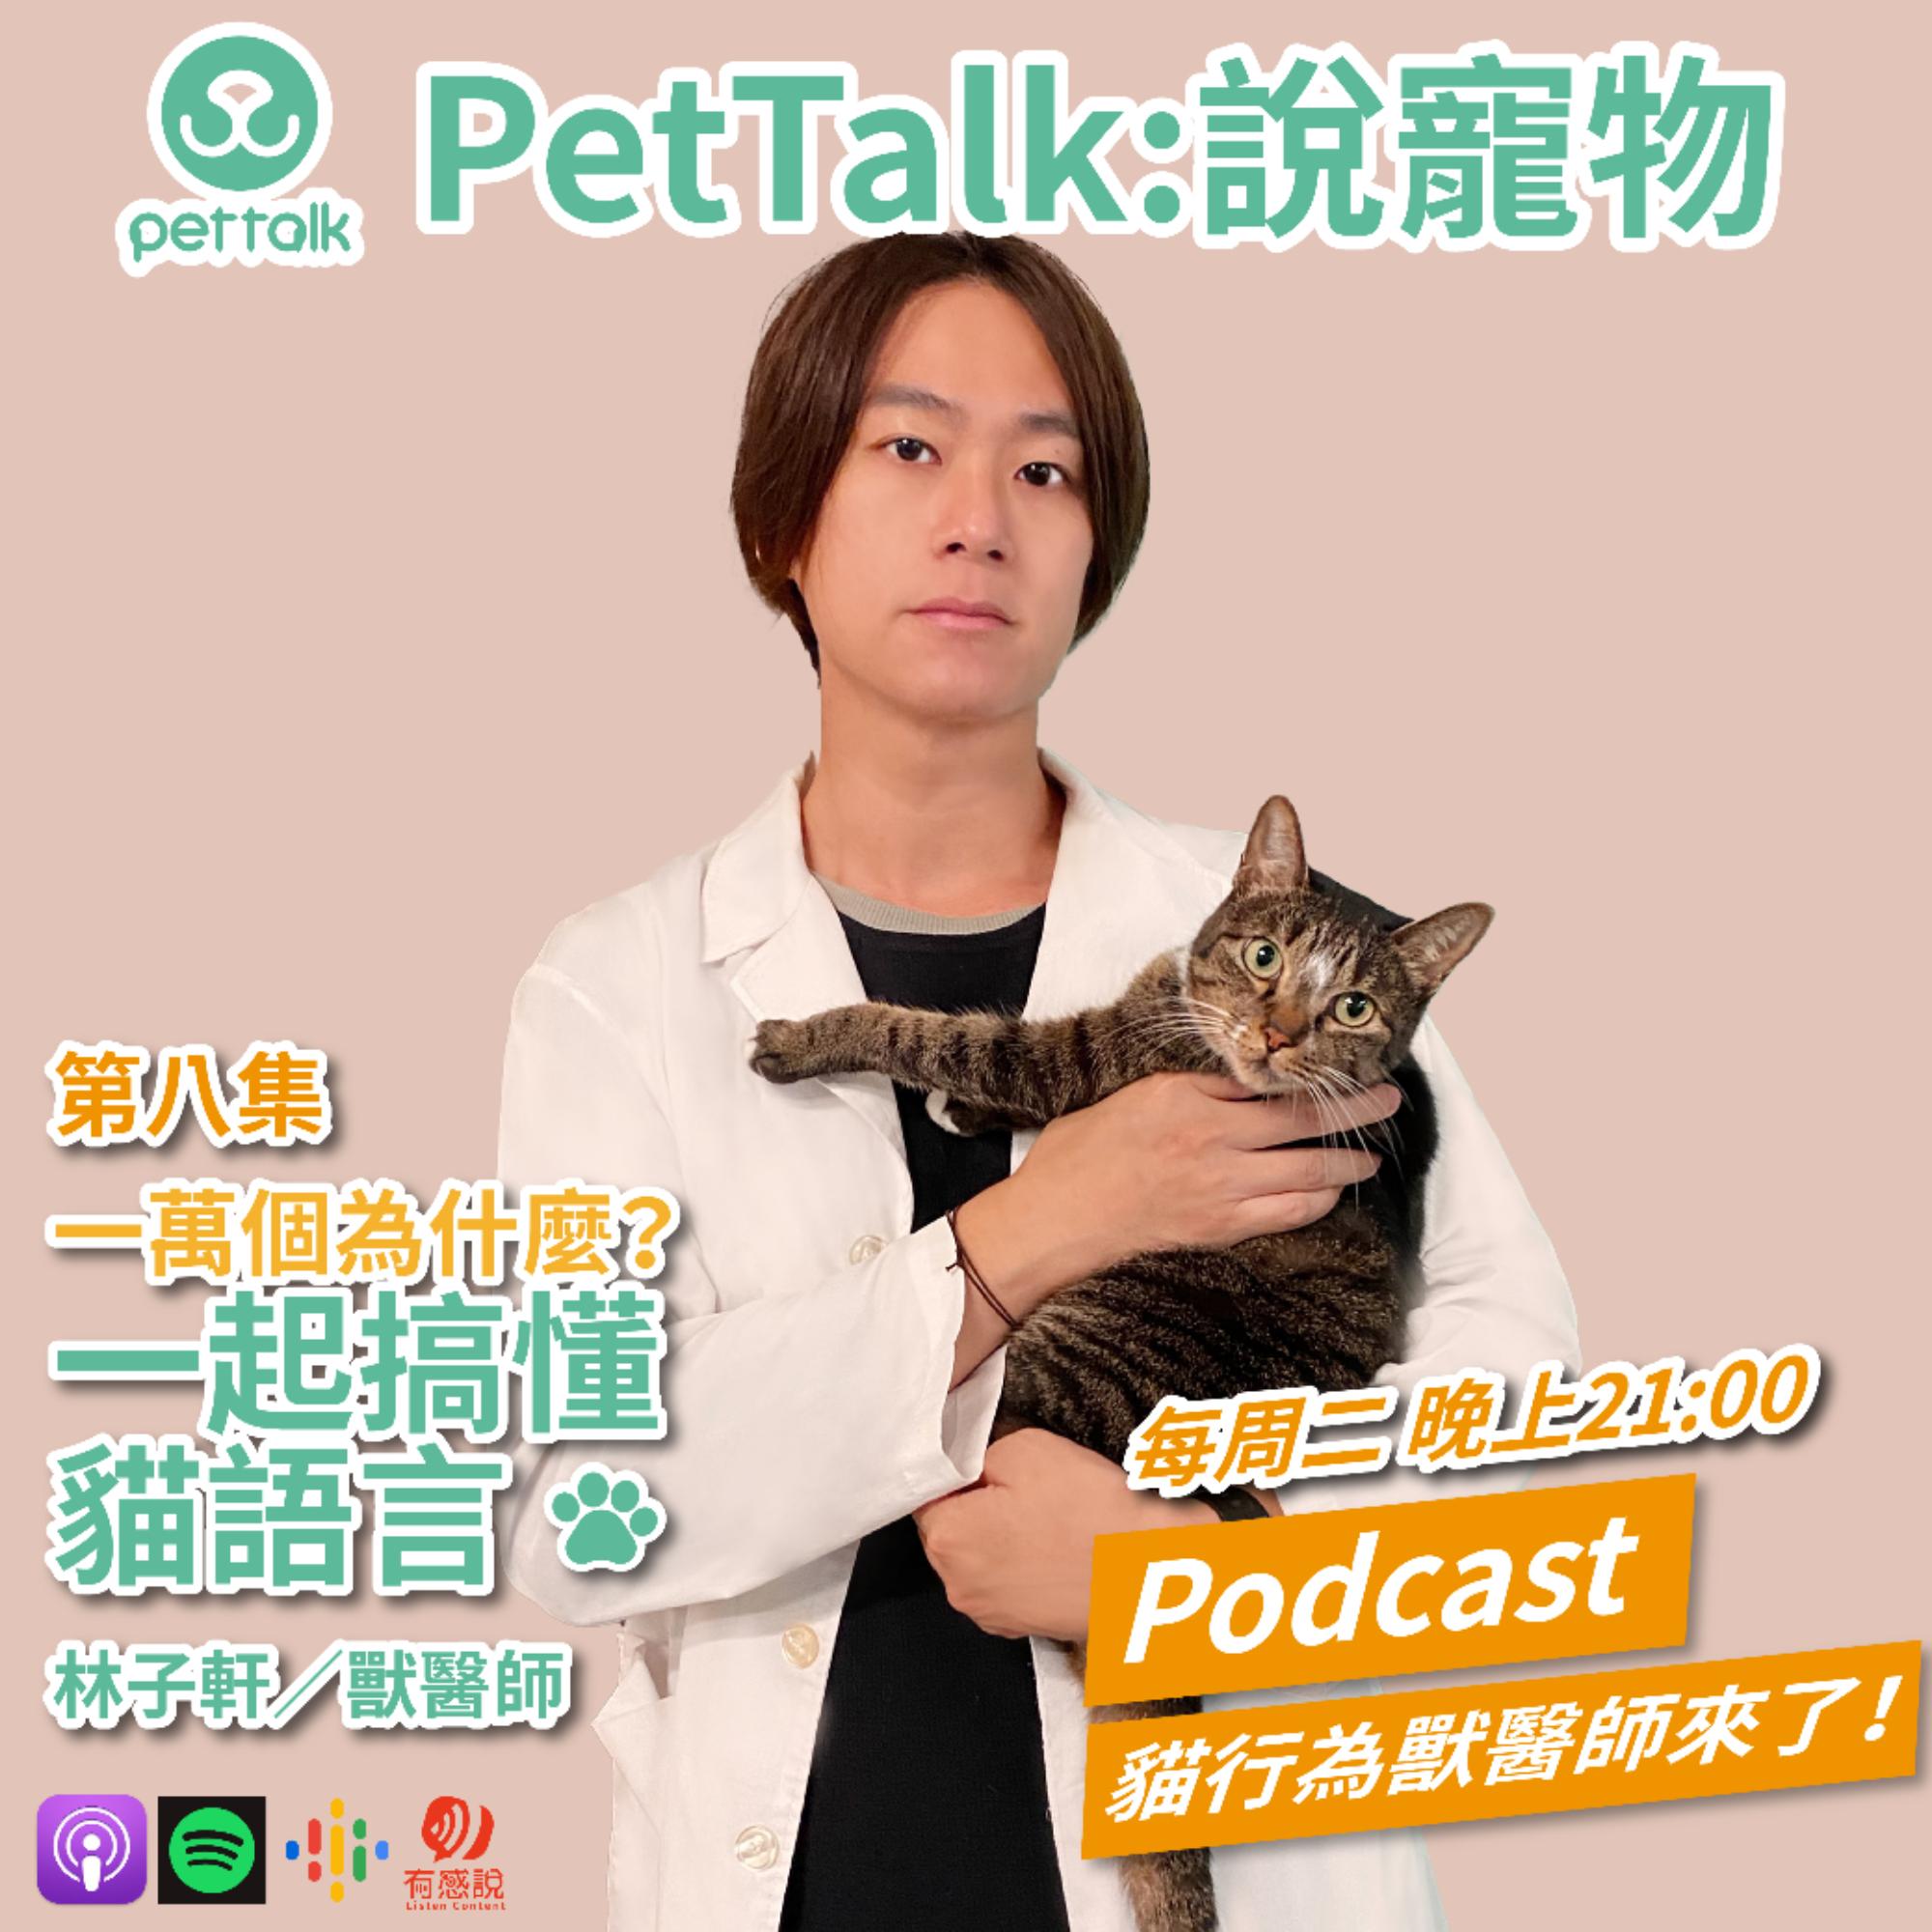 EP08|一萬個為什麼?一起搞懂貓語言 feat. 林子軒 獸醫師